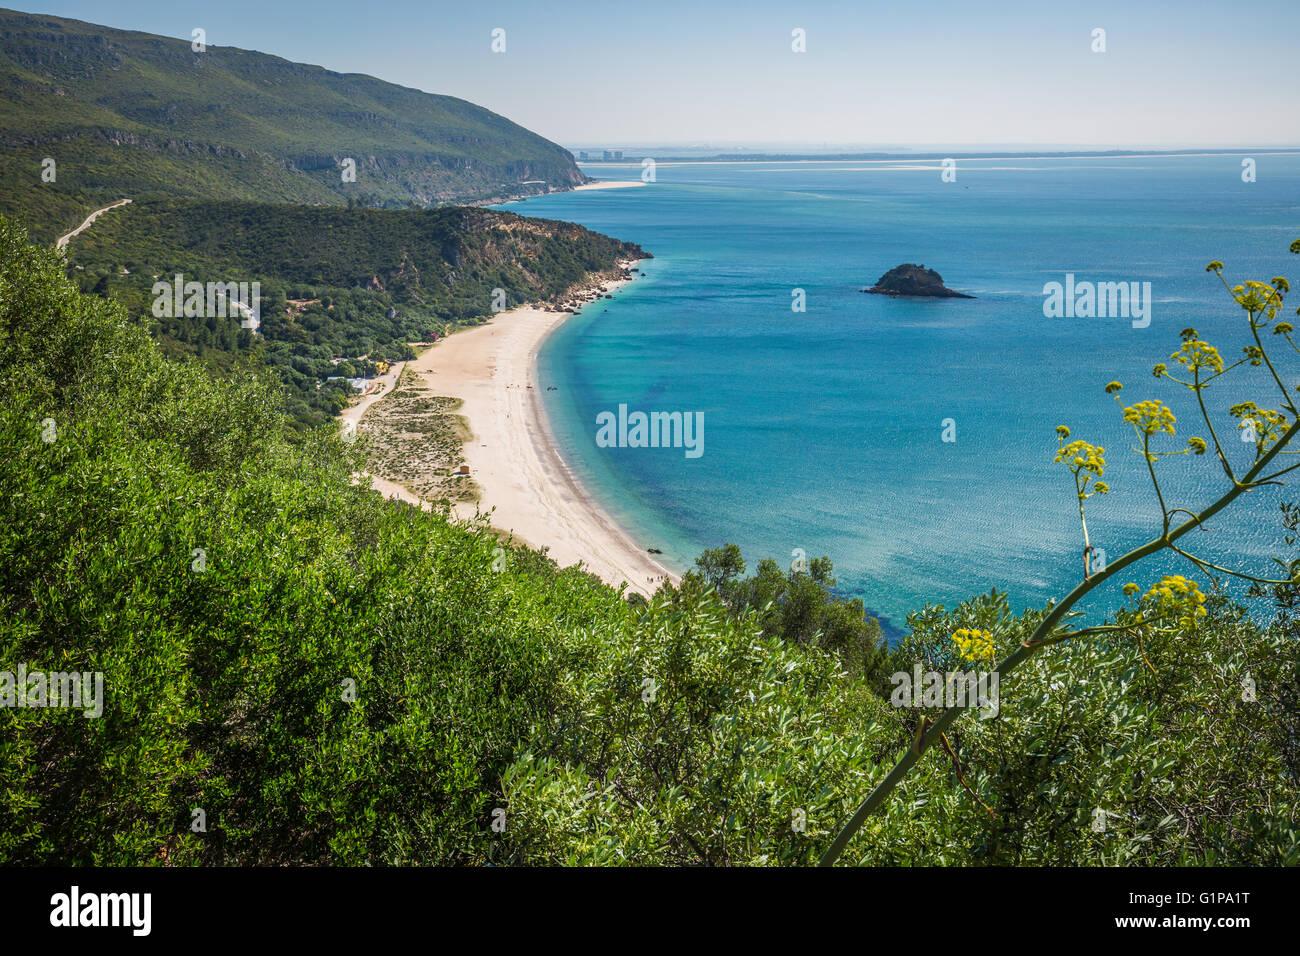 View of the beautiful coastal landscapes of the Arrabida region ...